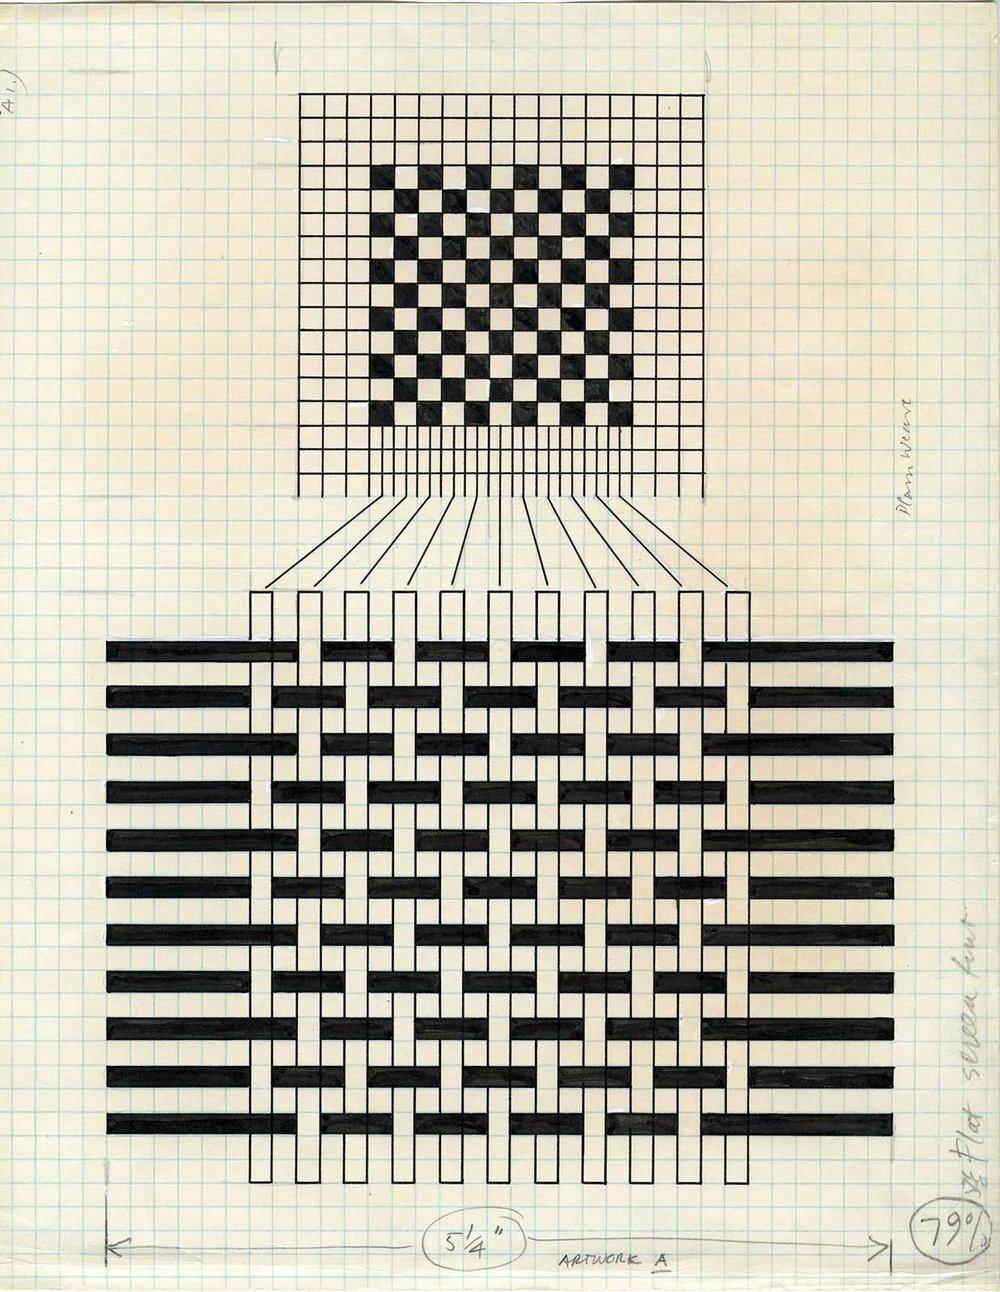 albers-diagram-e1511282165746.jpg